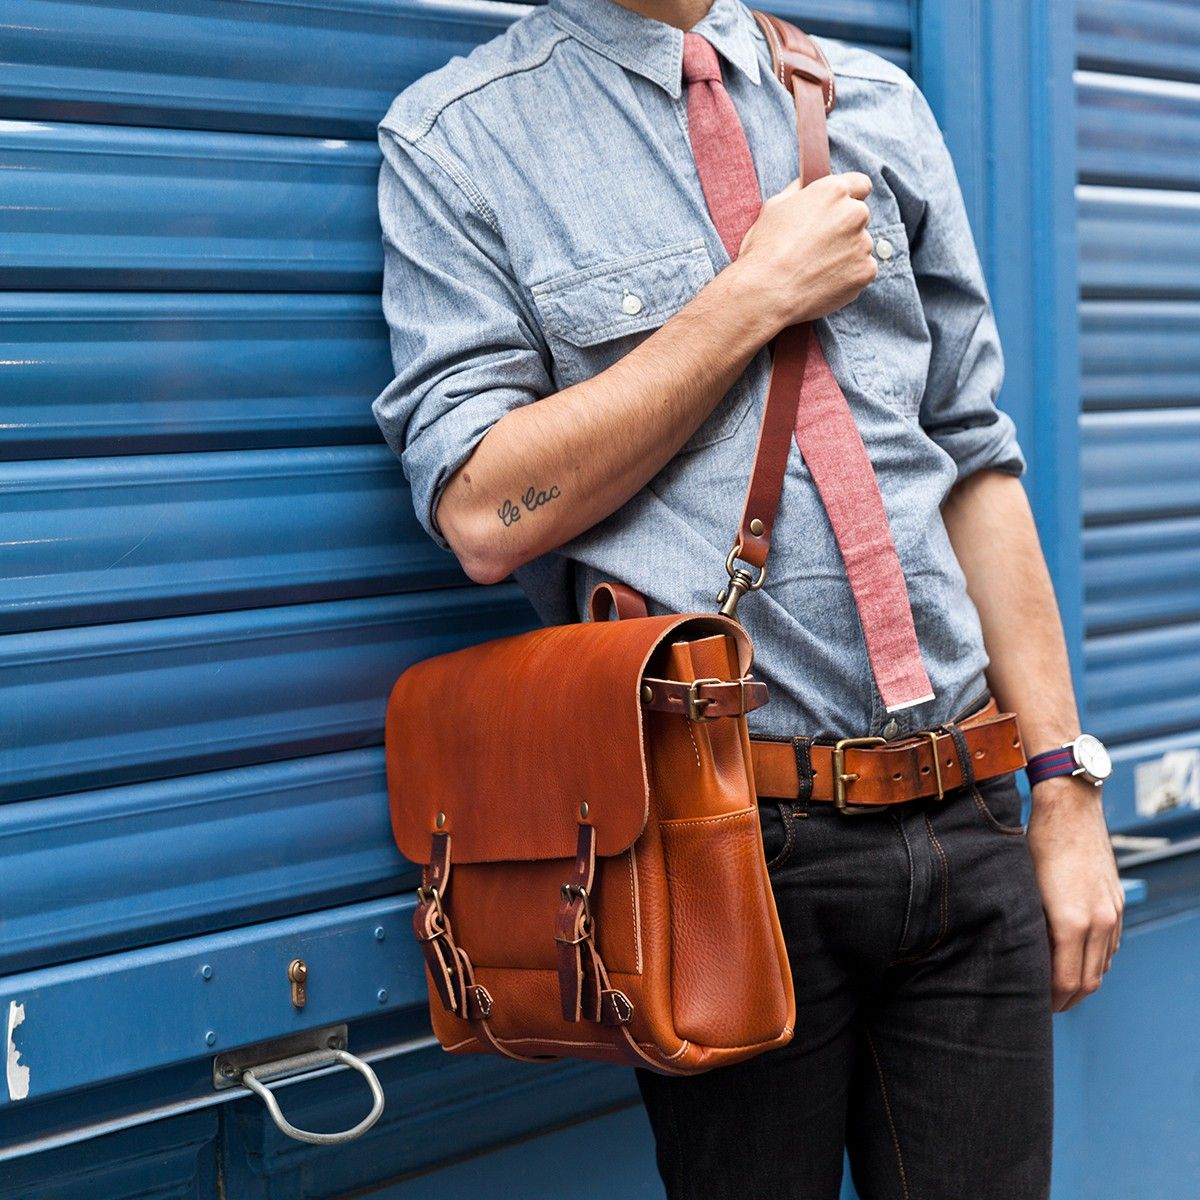 Postman Bag Eclair - Pain brulé